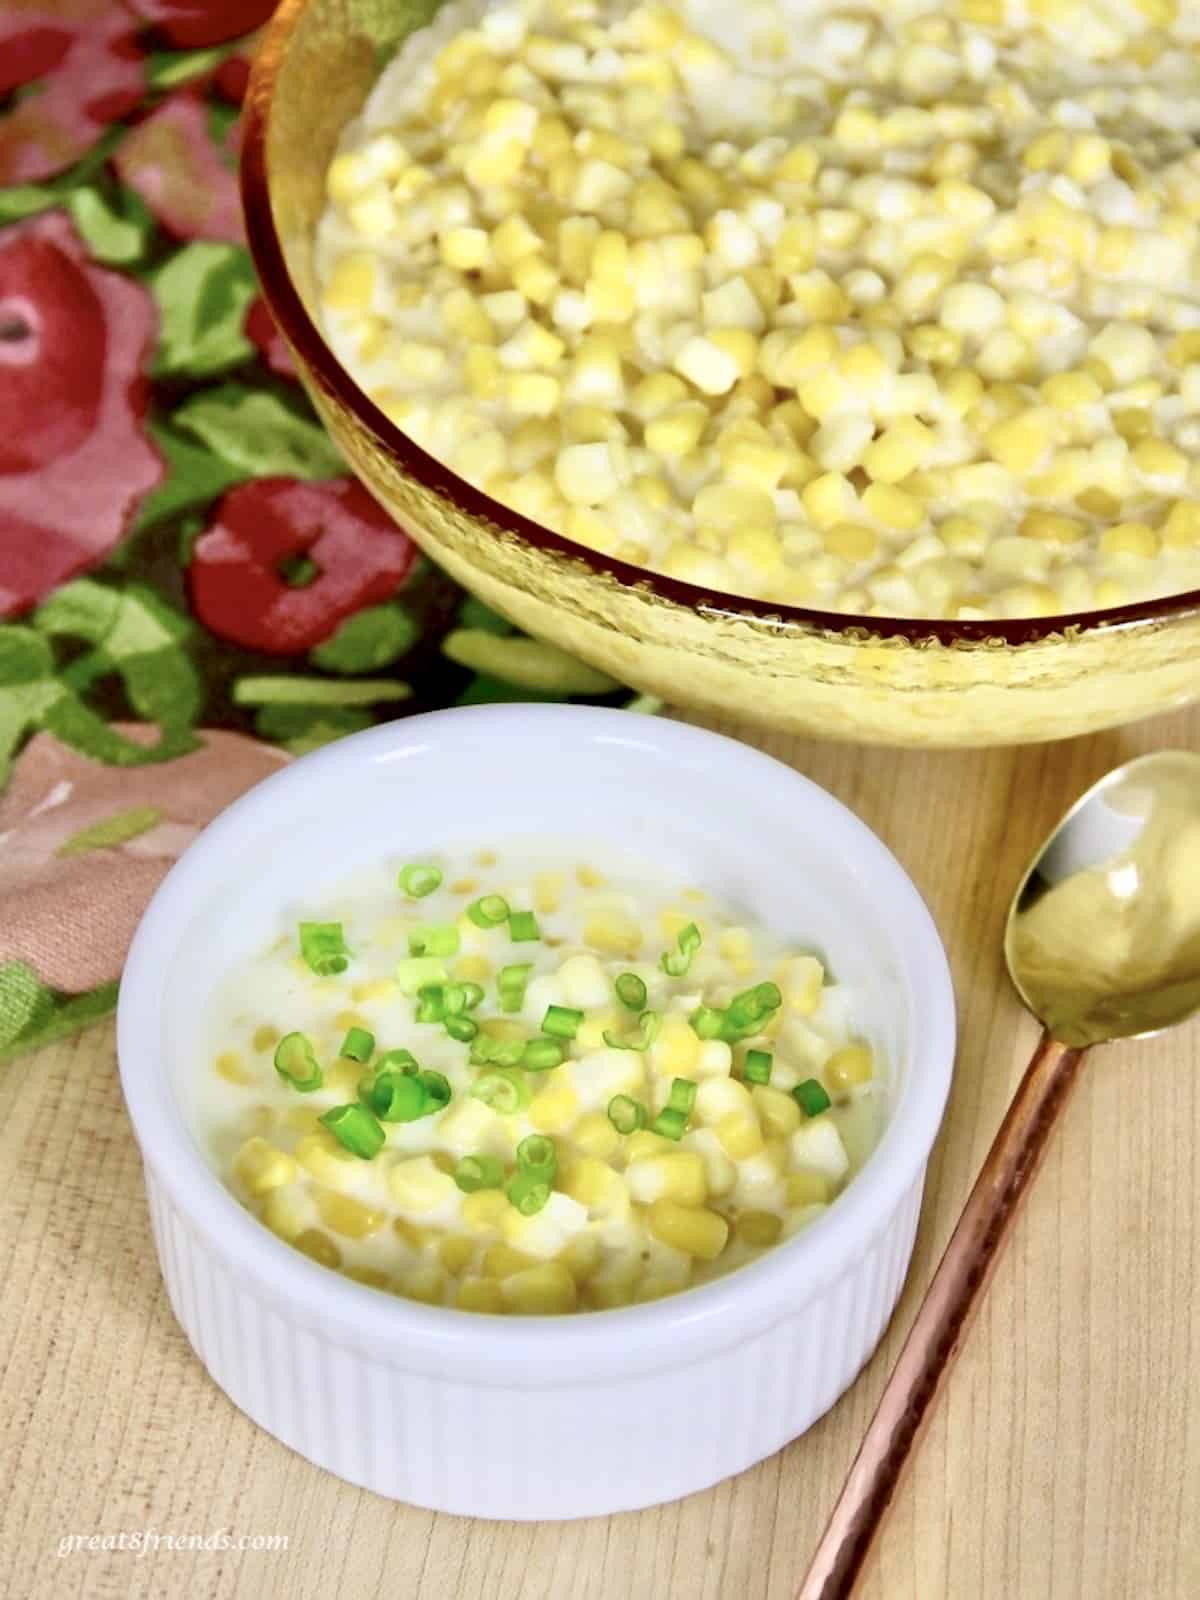 Corn that tastes like Gulliver's creamed corn.